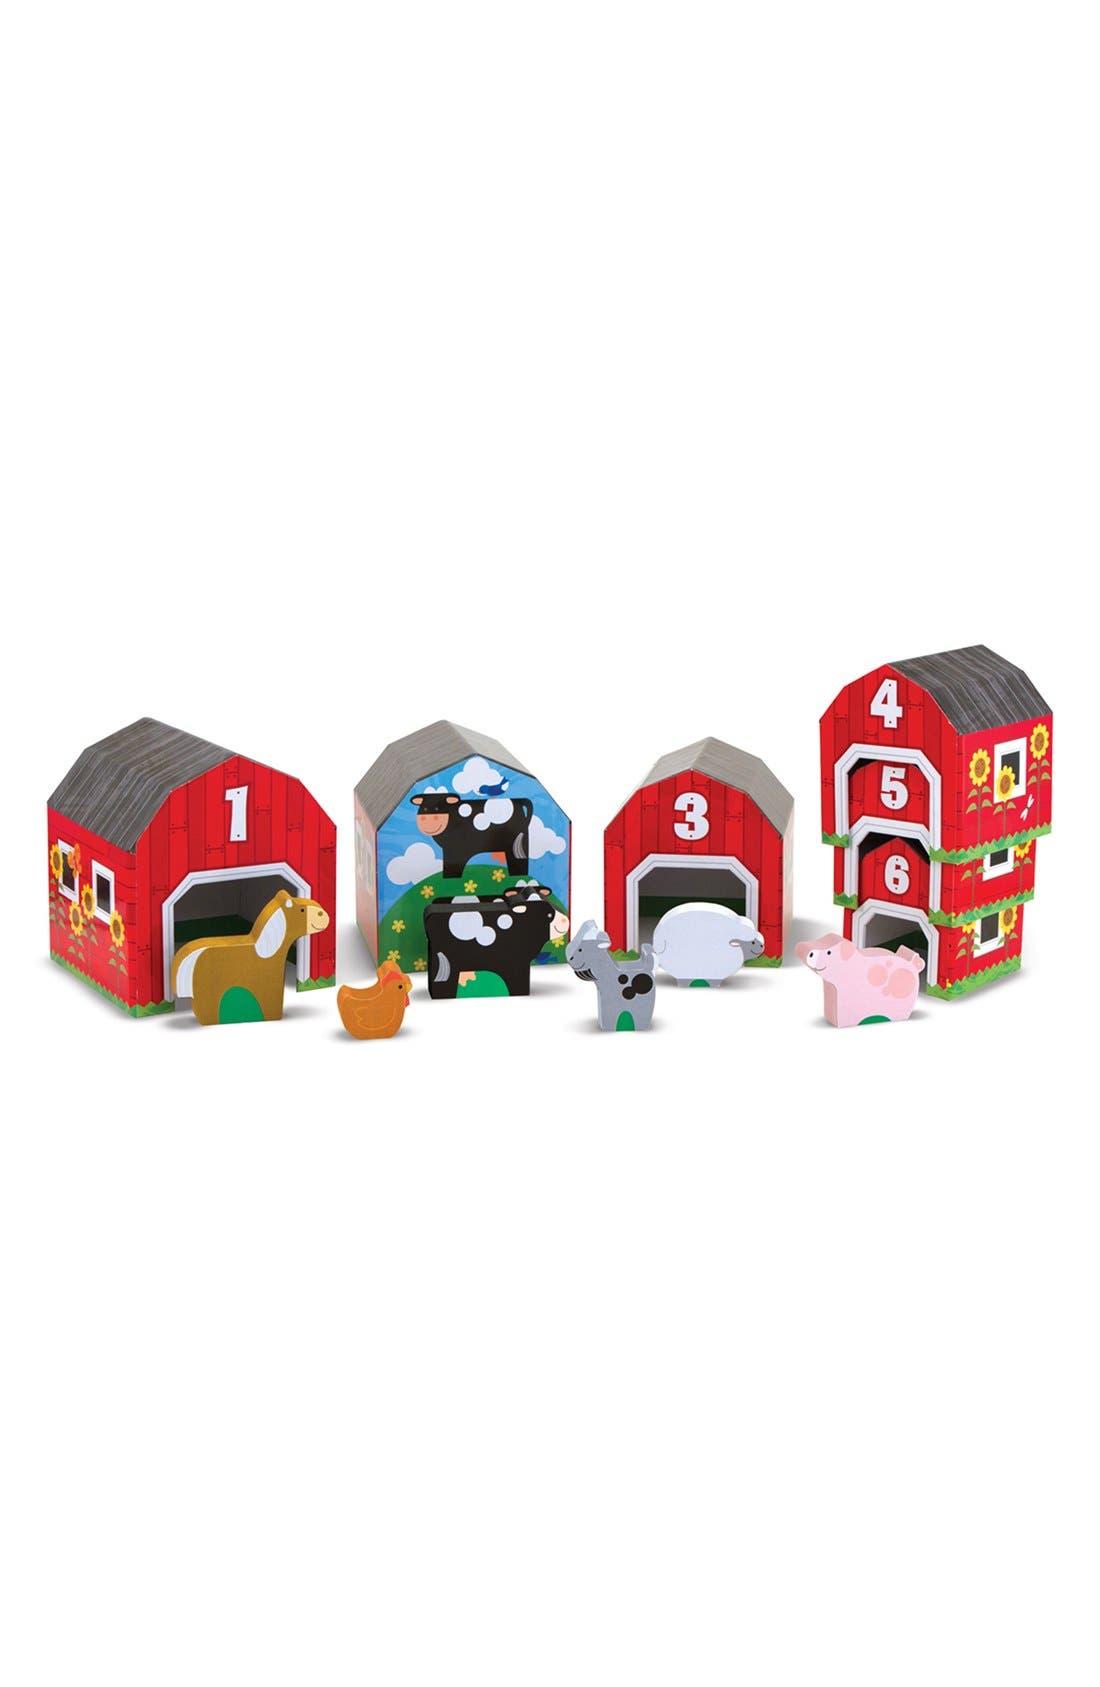 Main Image - Melissa & Doug Nesting Barns & Animals Toy